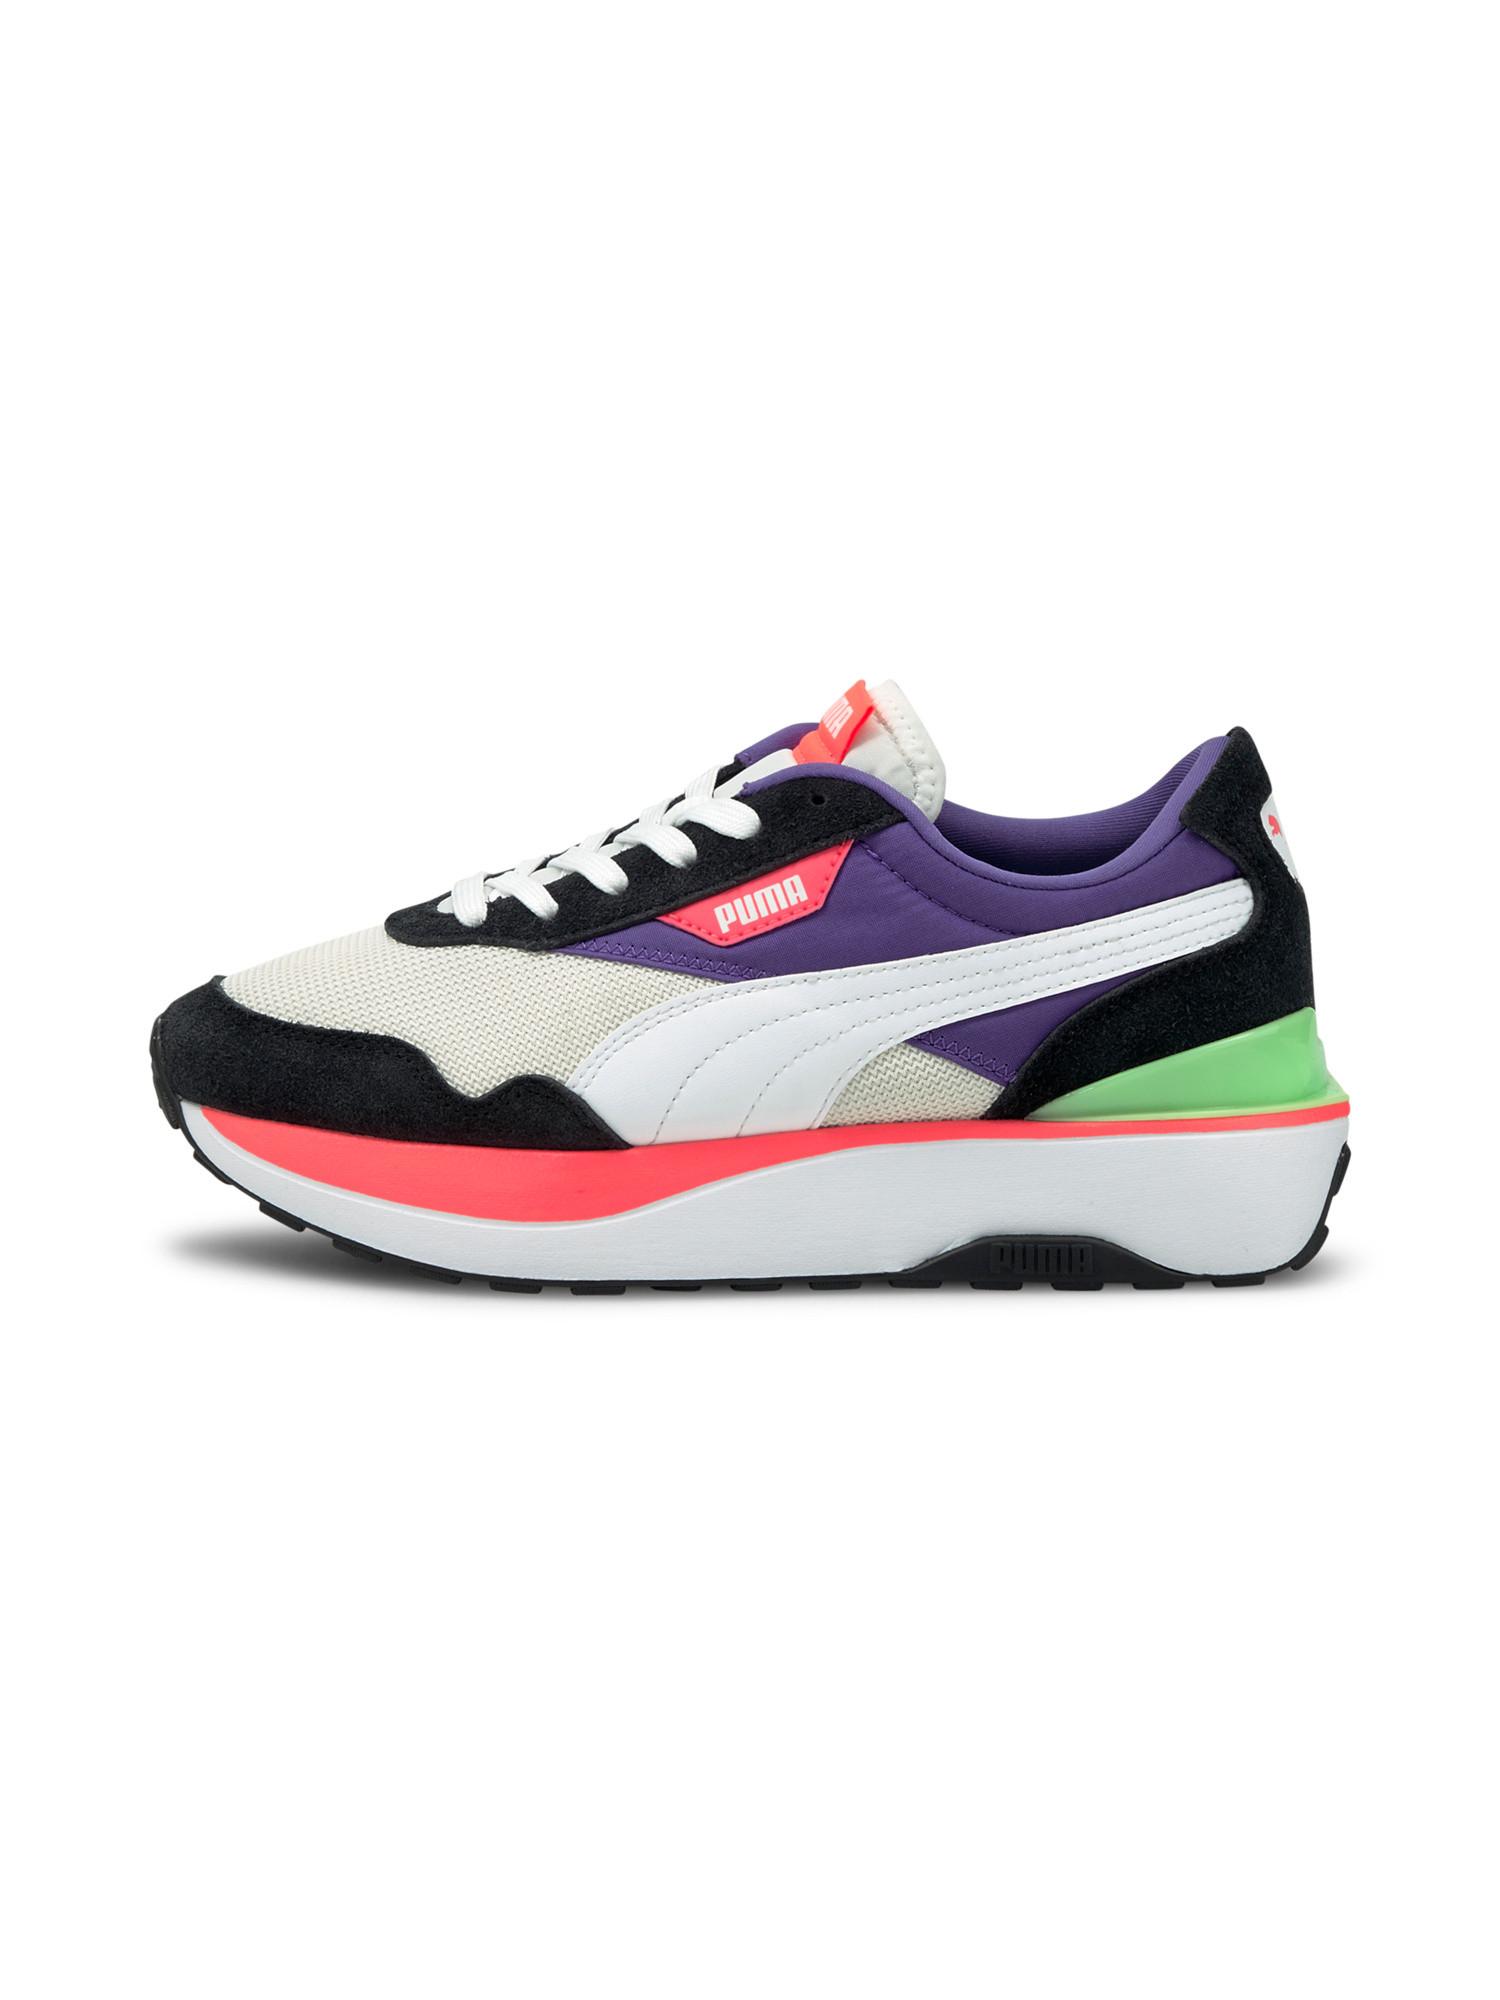 Sneakers Oslo Maya, Multicolor, large image number 0